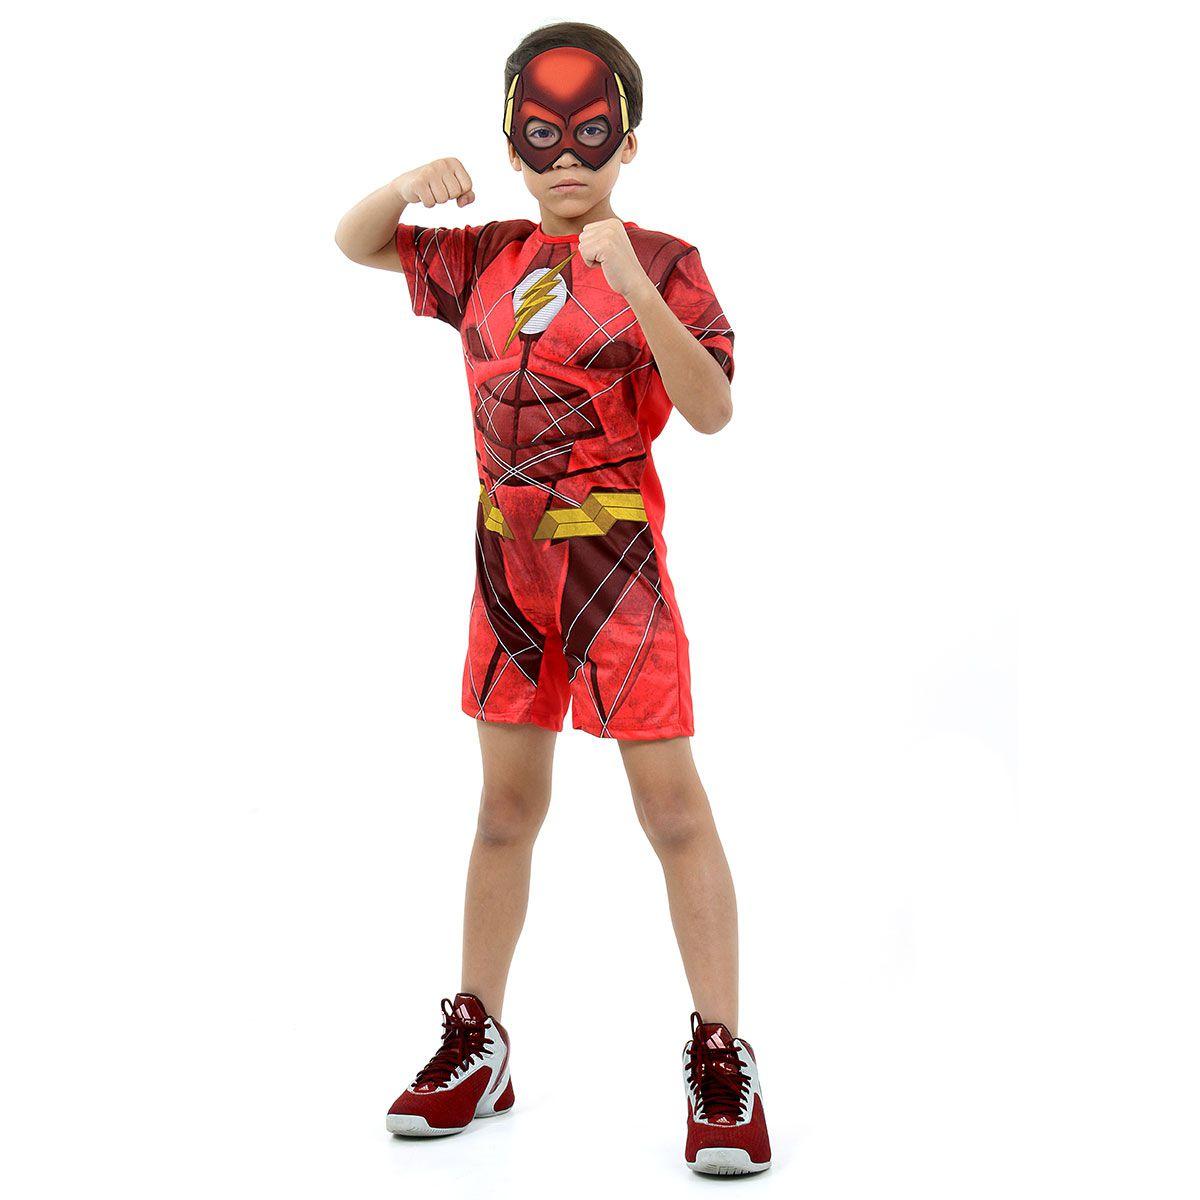 Fantasia The Flash com Musculatura Curta